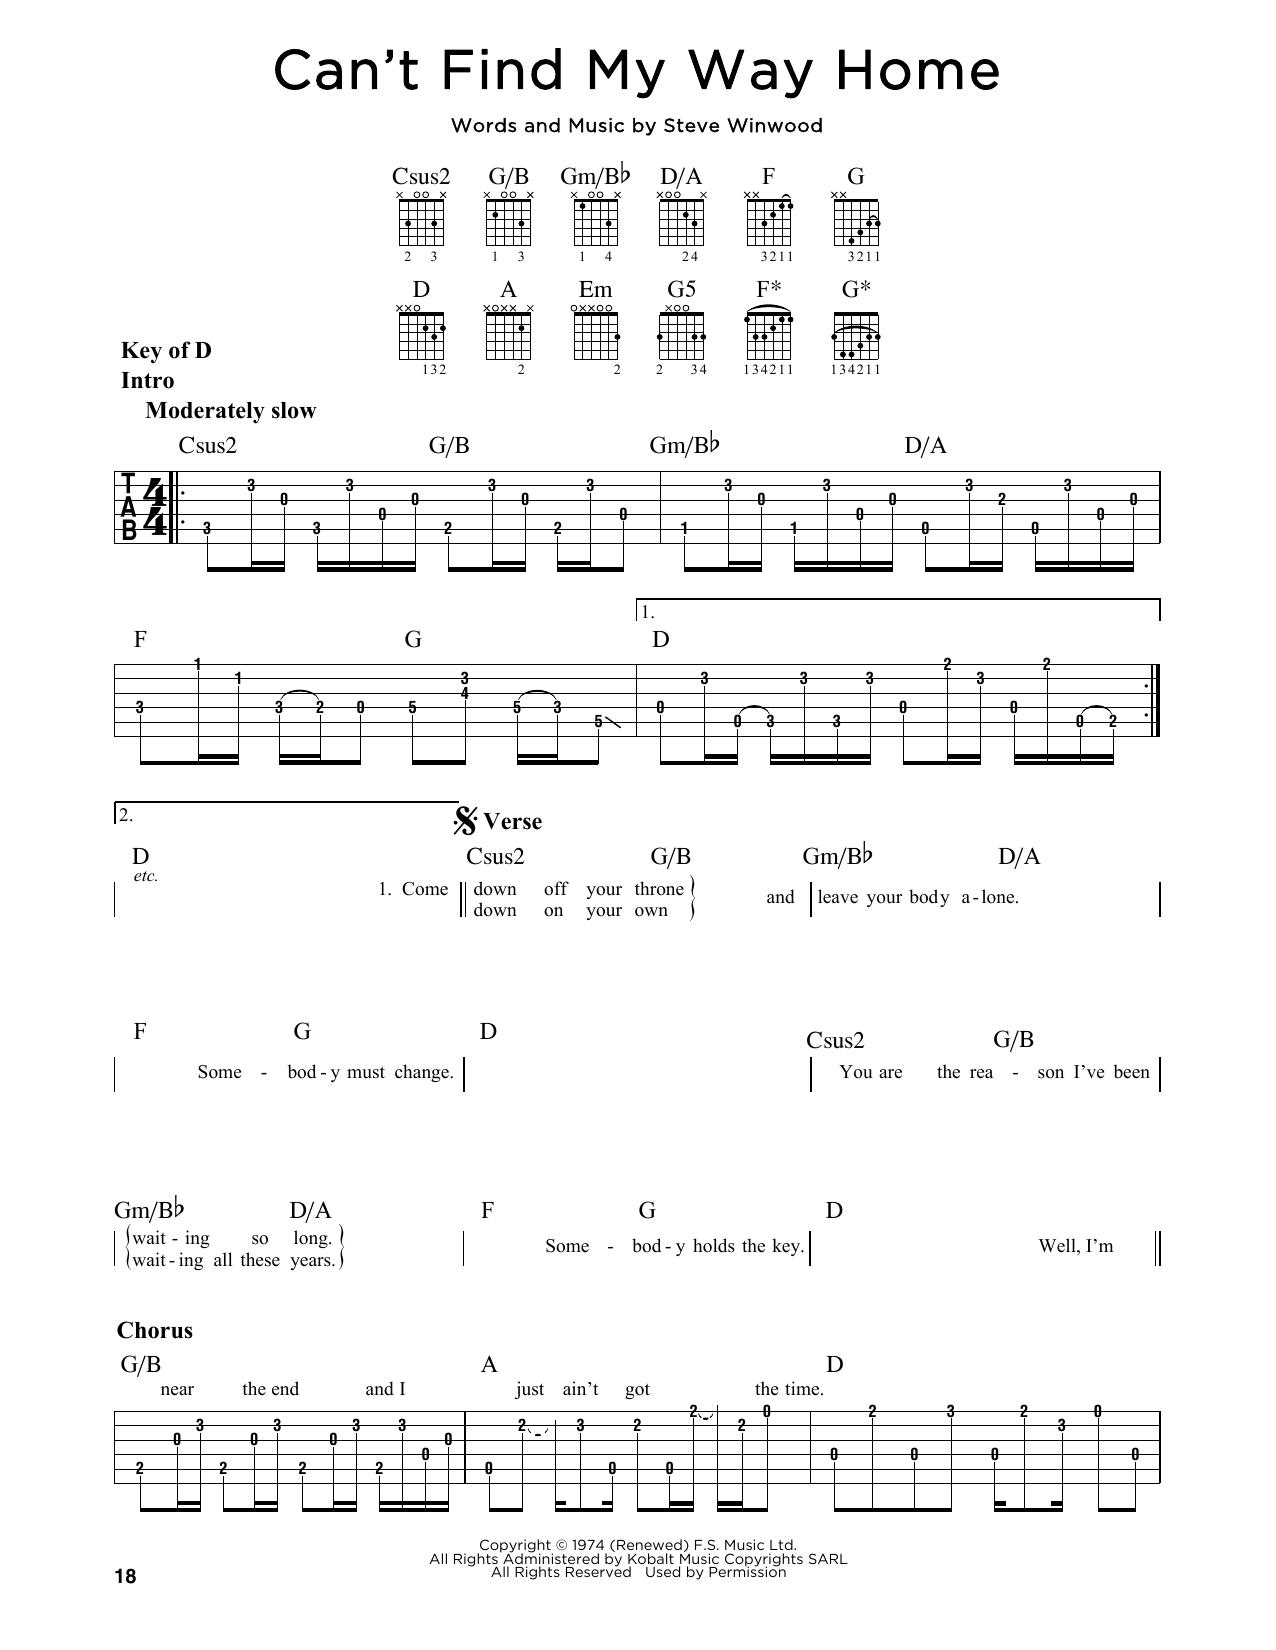 Freshsheetmusicmediacatalogproduct161634